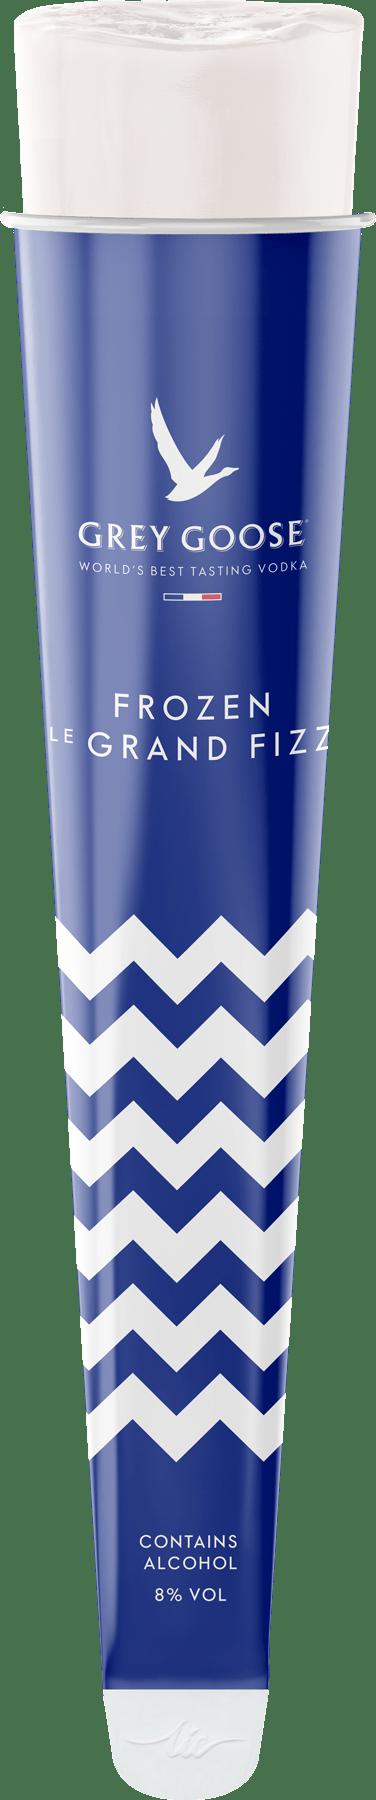 GREY GOOSE:Le Grand Fizz